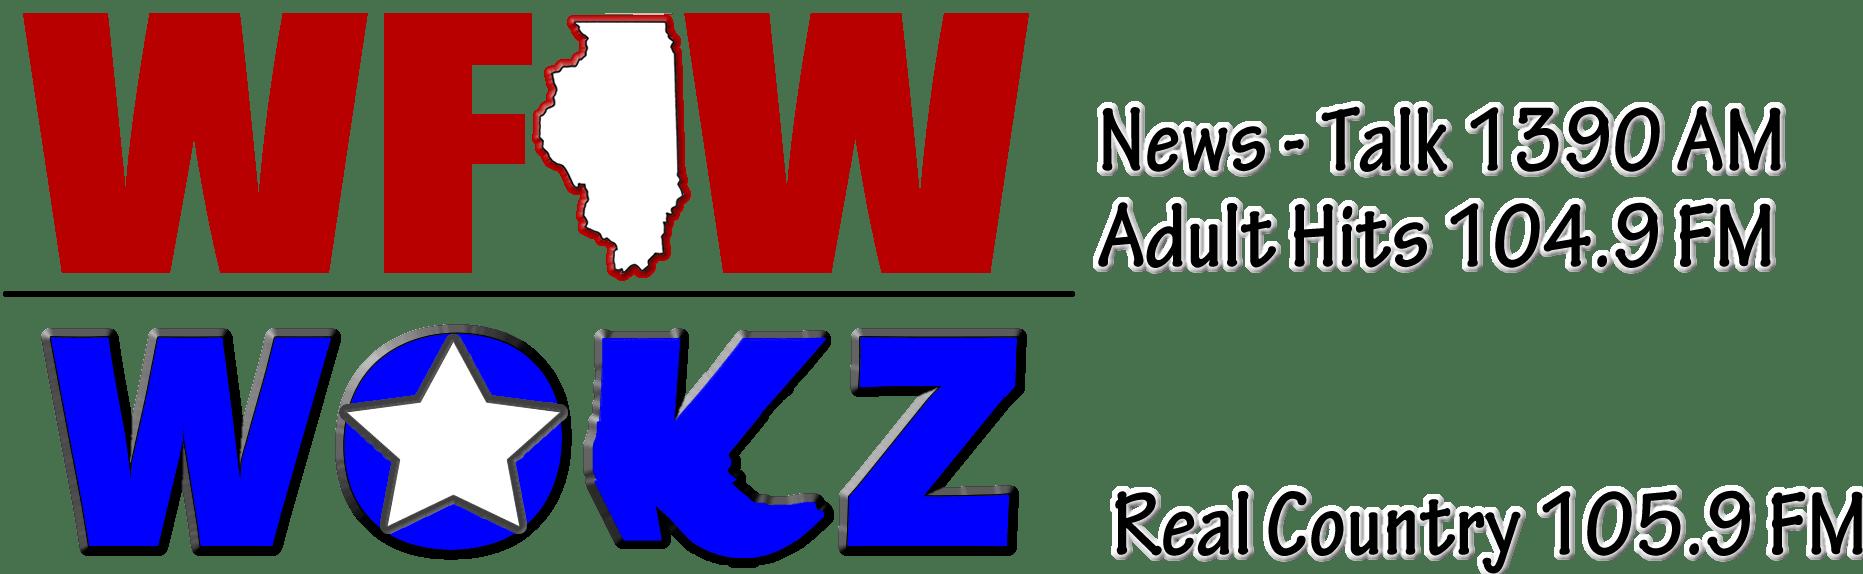 WFIW Website Logo